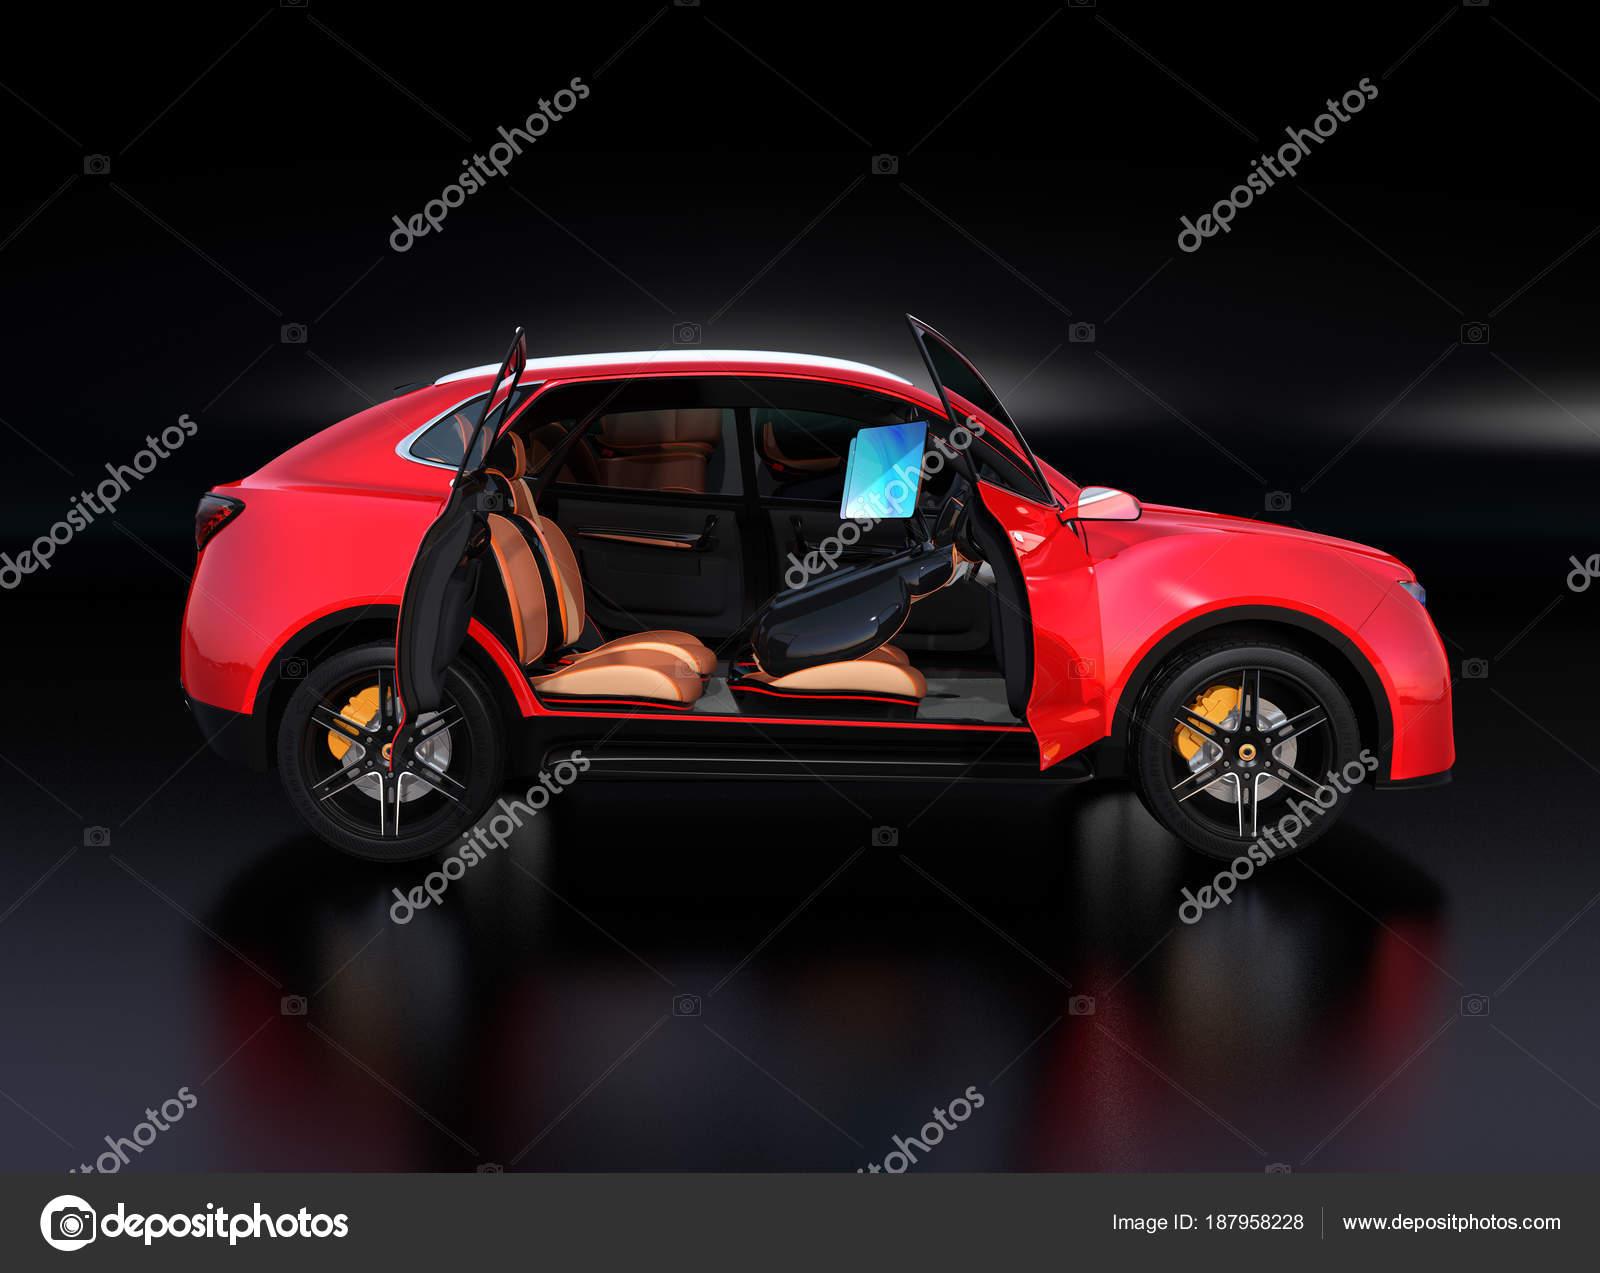 Electric self driving suv car interior design front seats equipped electric self driving suv car interior design front seats equipped stock photo solutioingenieria Choice Image